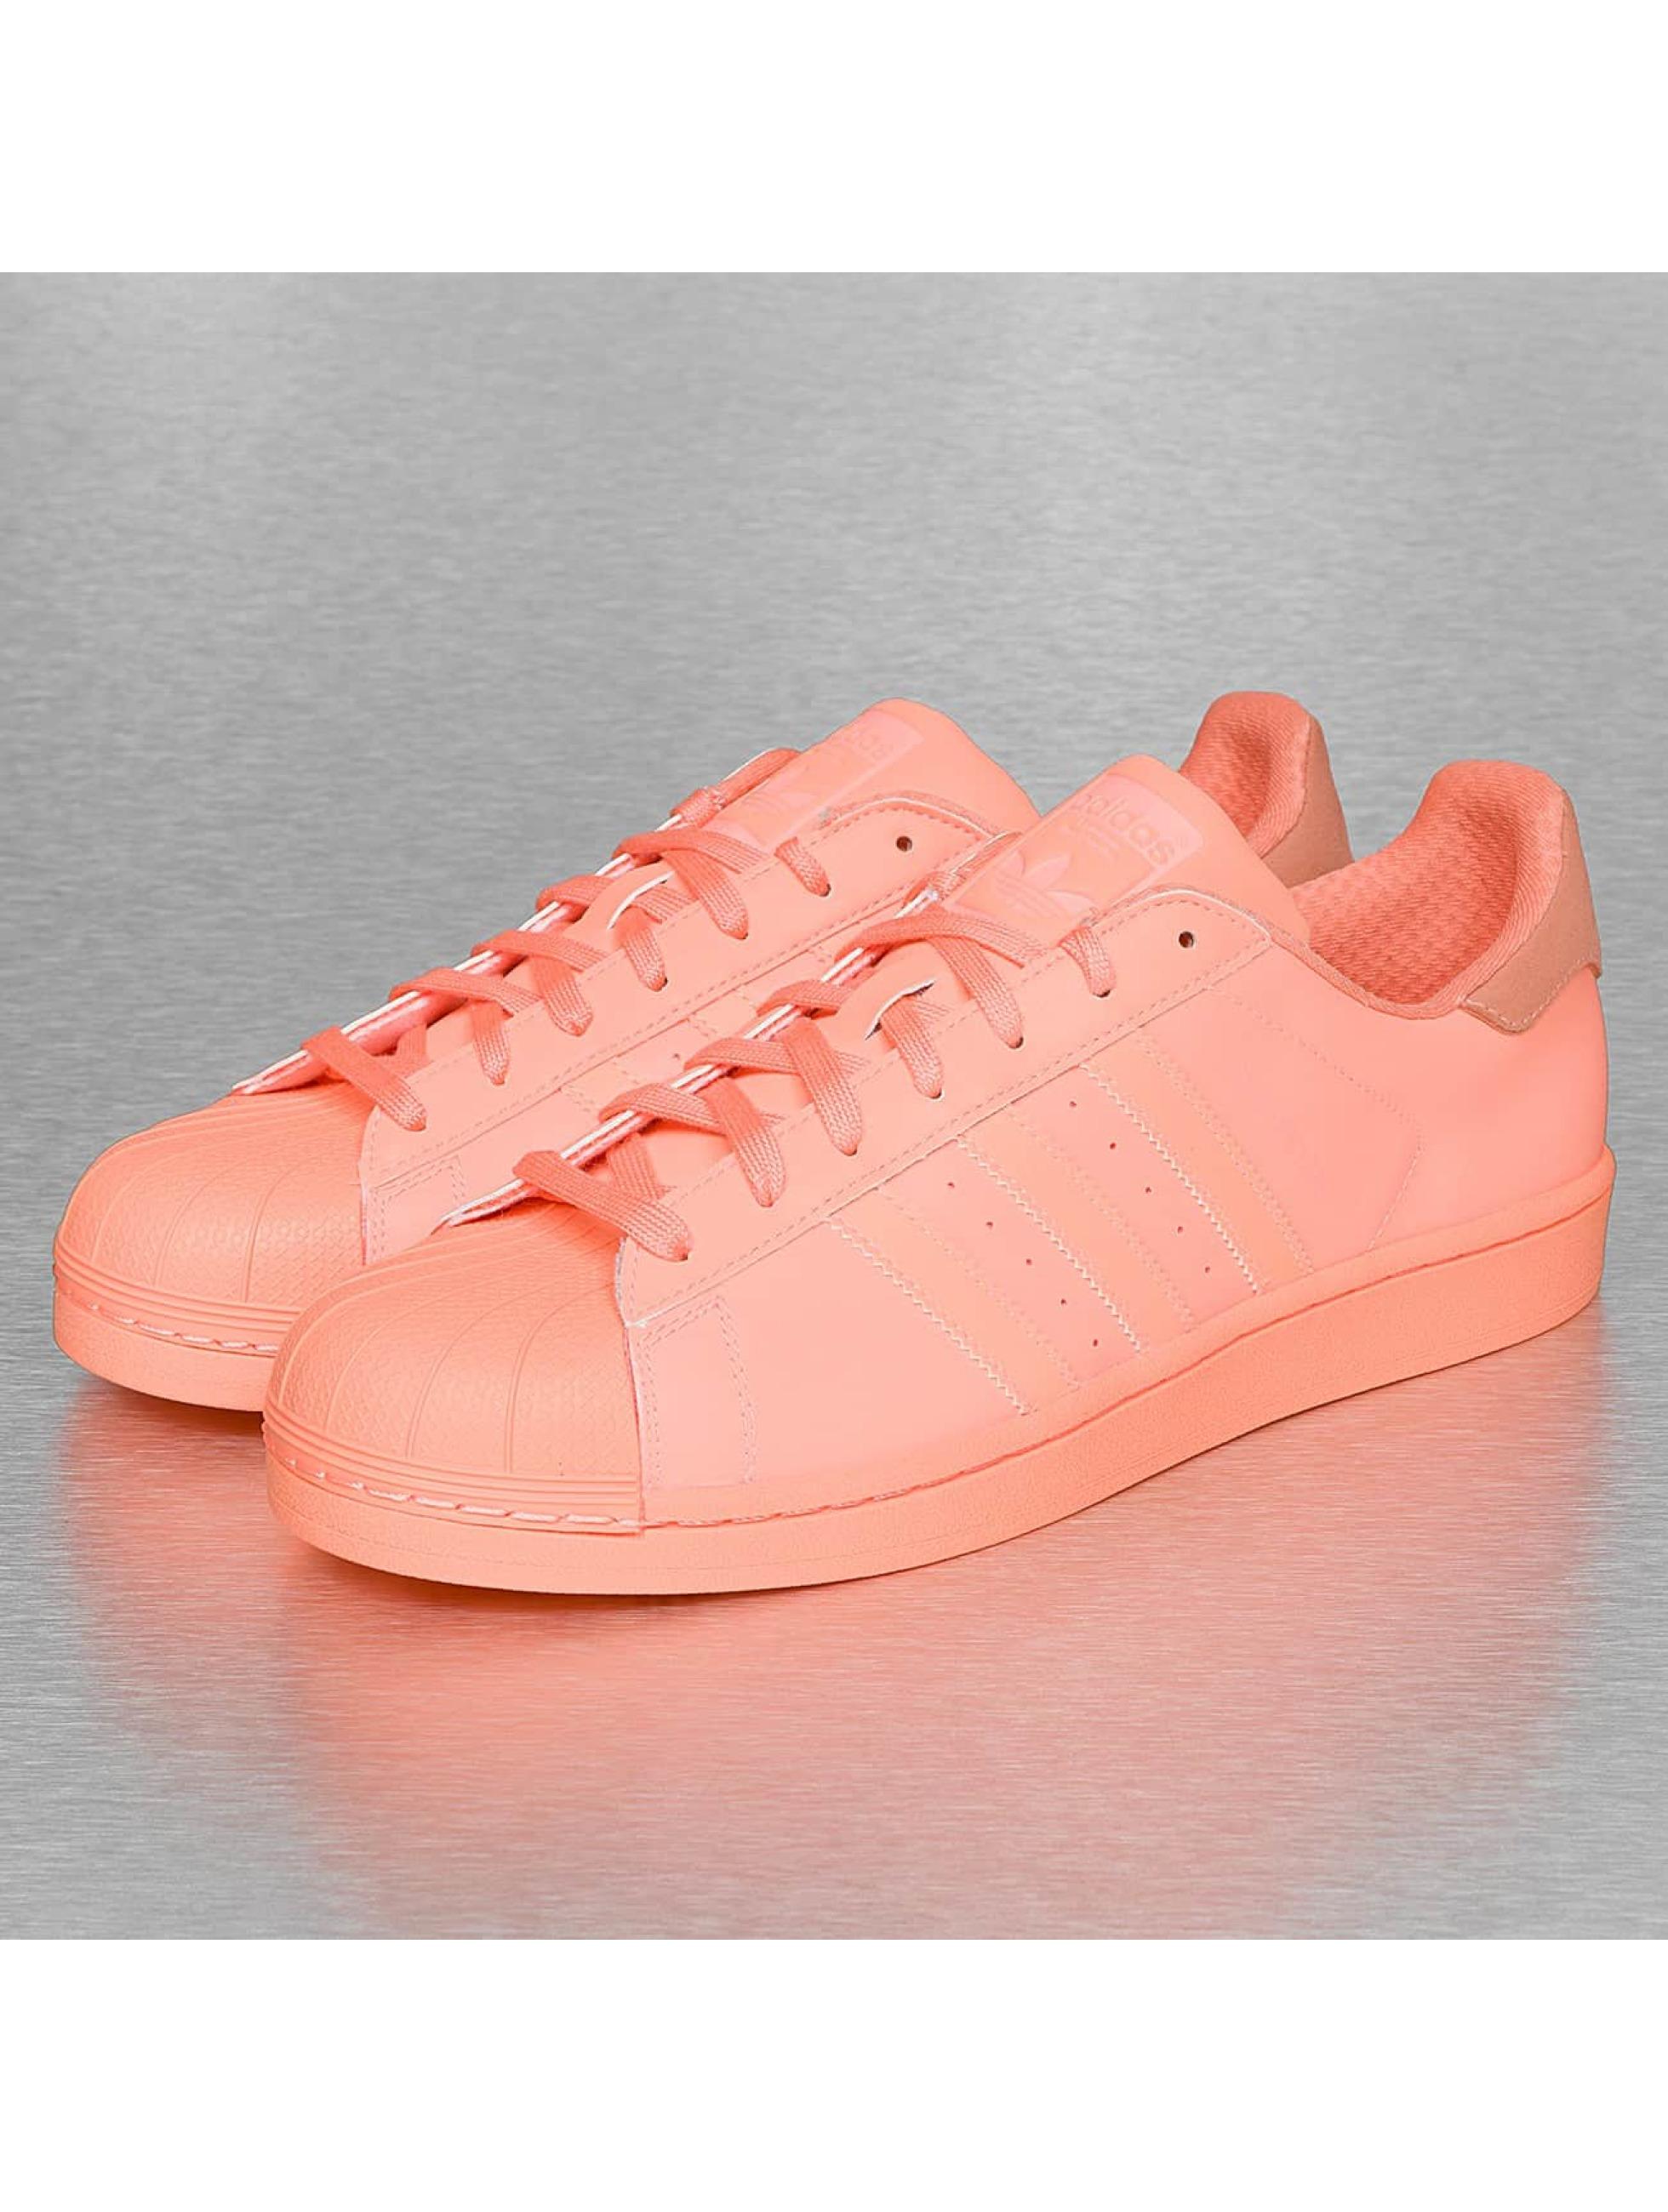 Sneaker Superstar Adicolor in orange